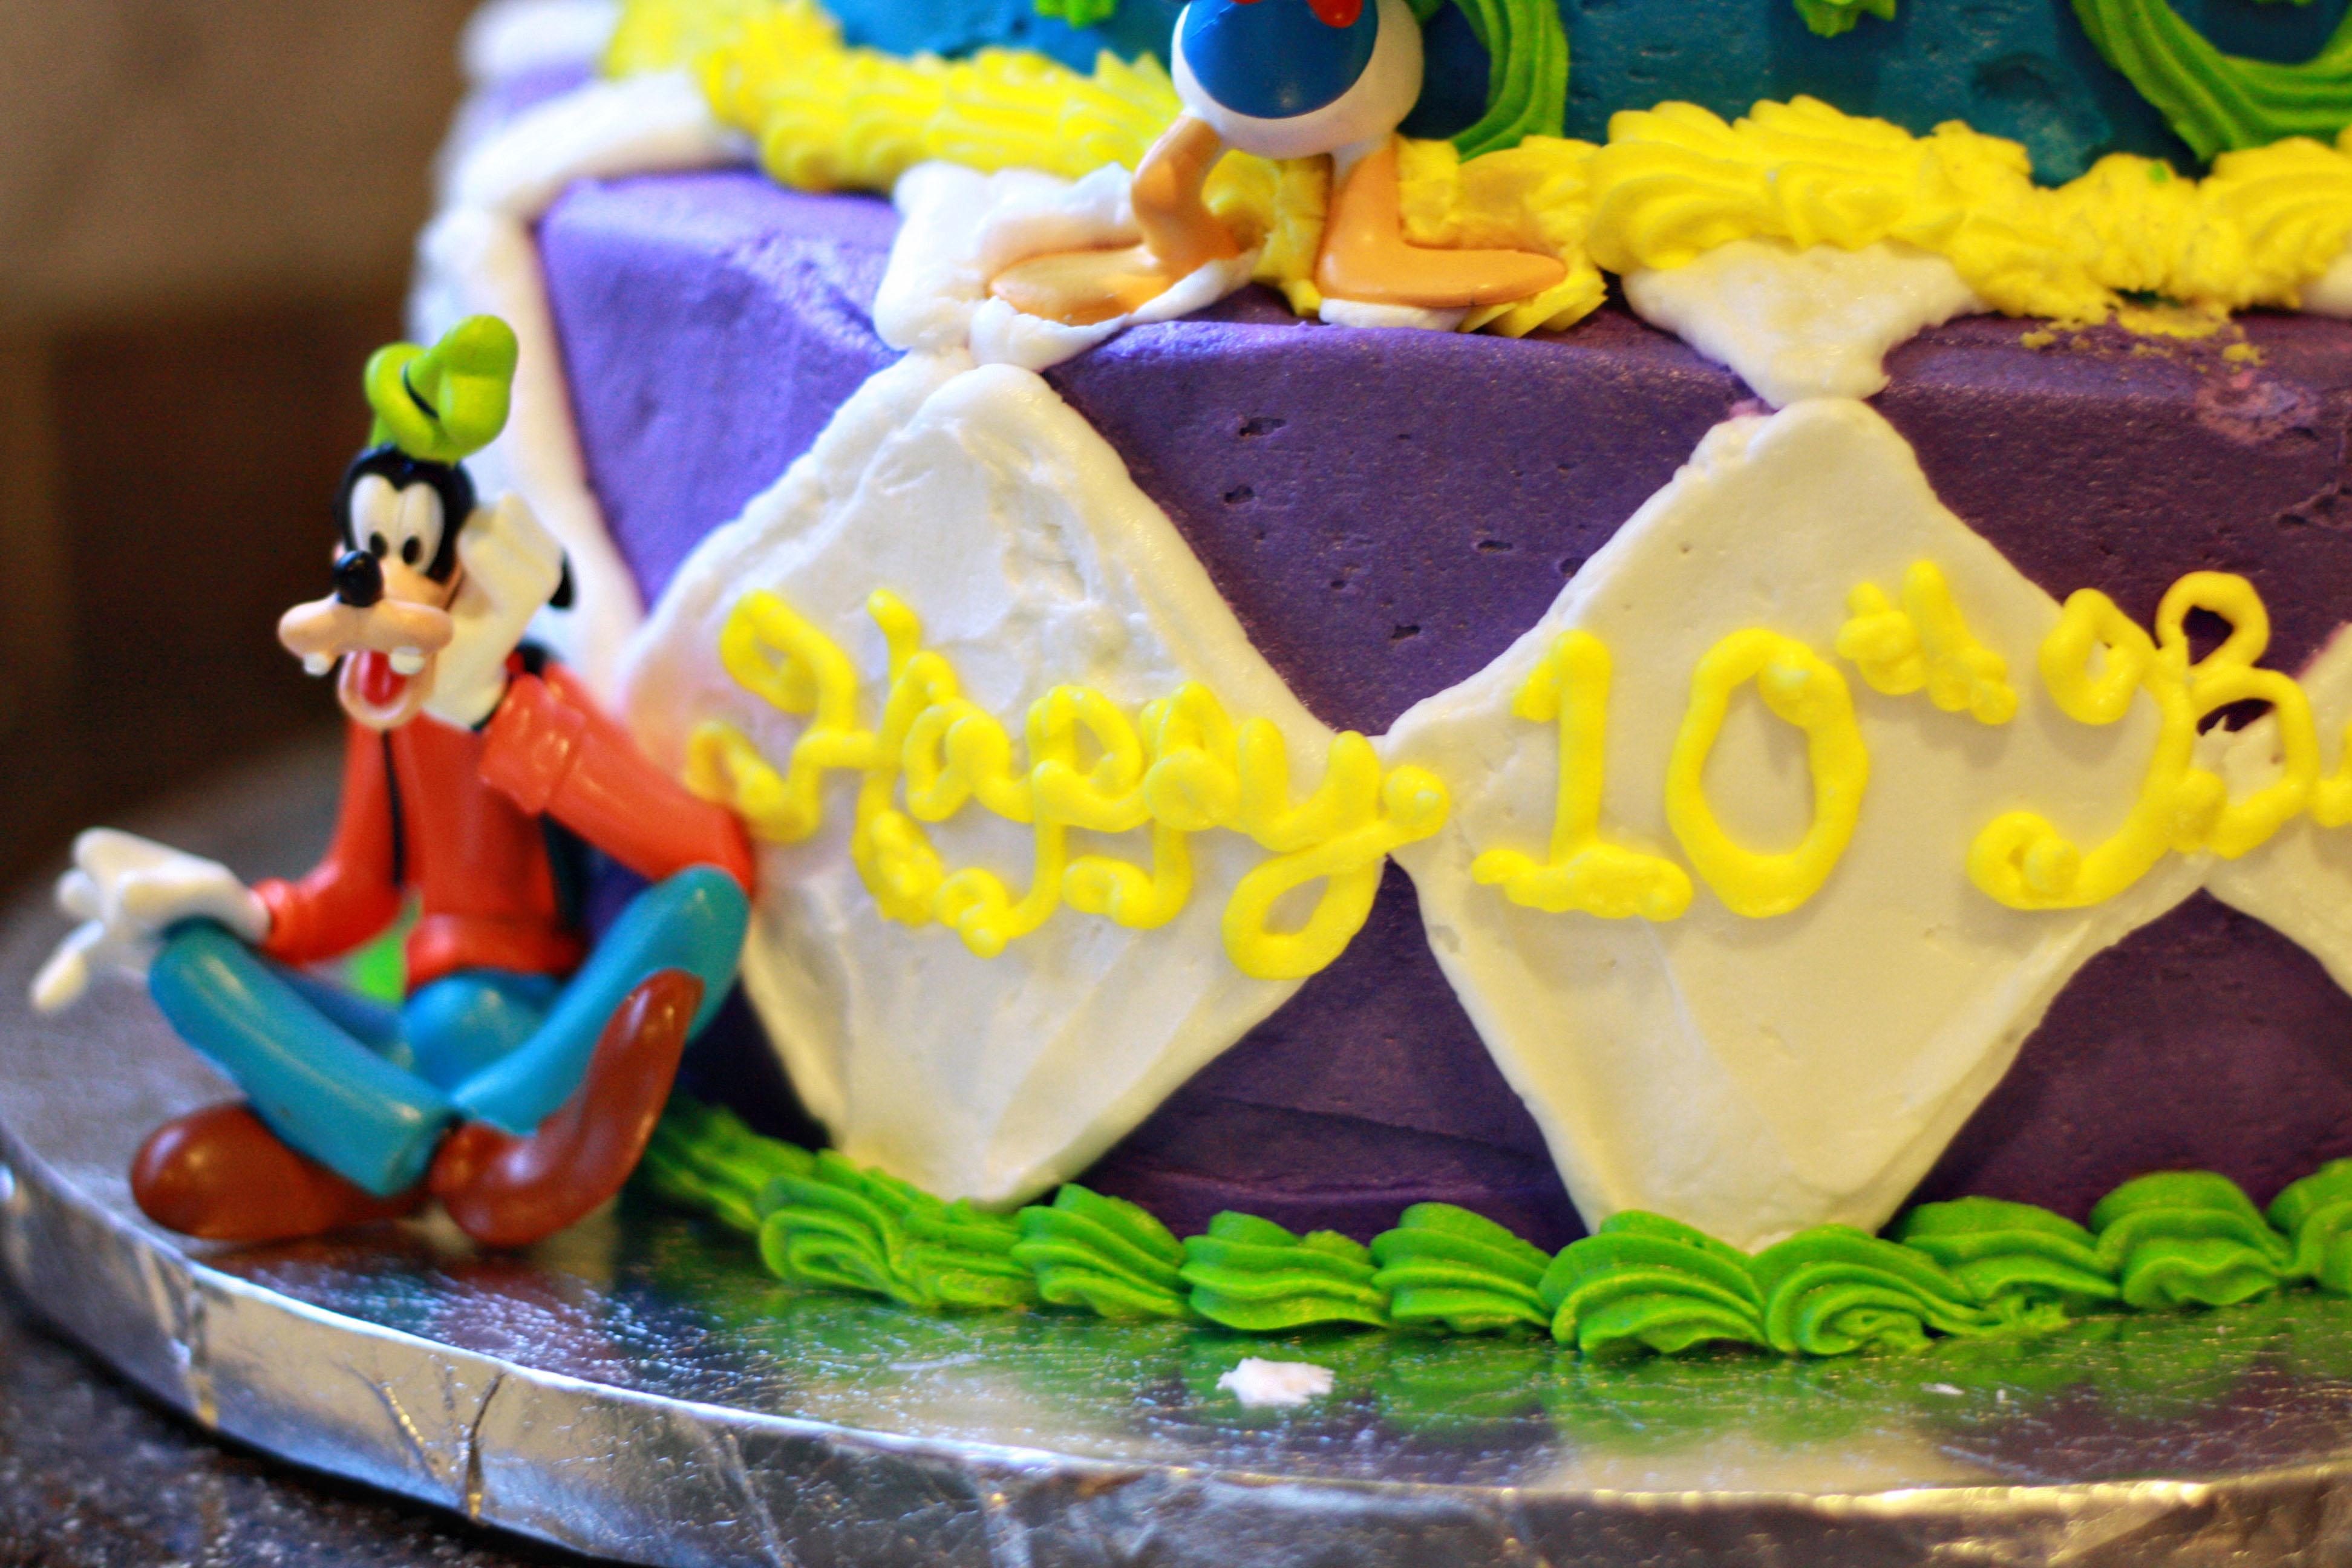 The Perfect 10 Cake Elastamoms Excerpts